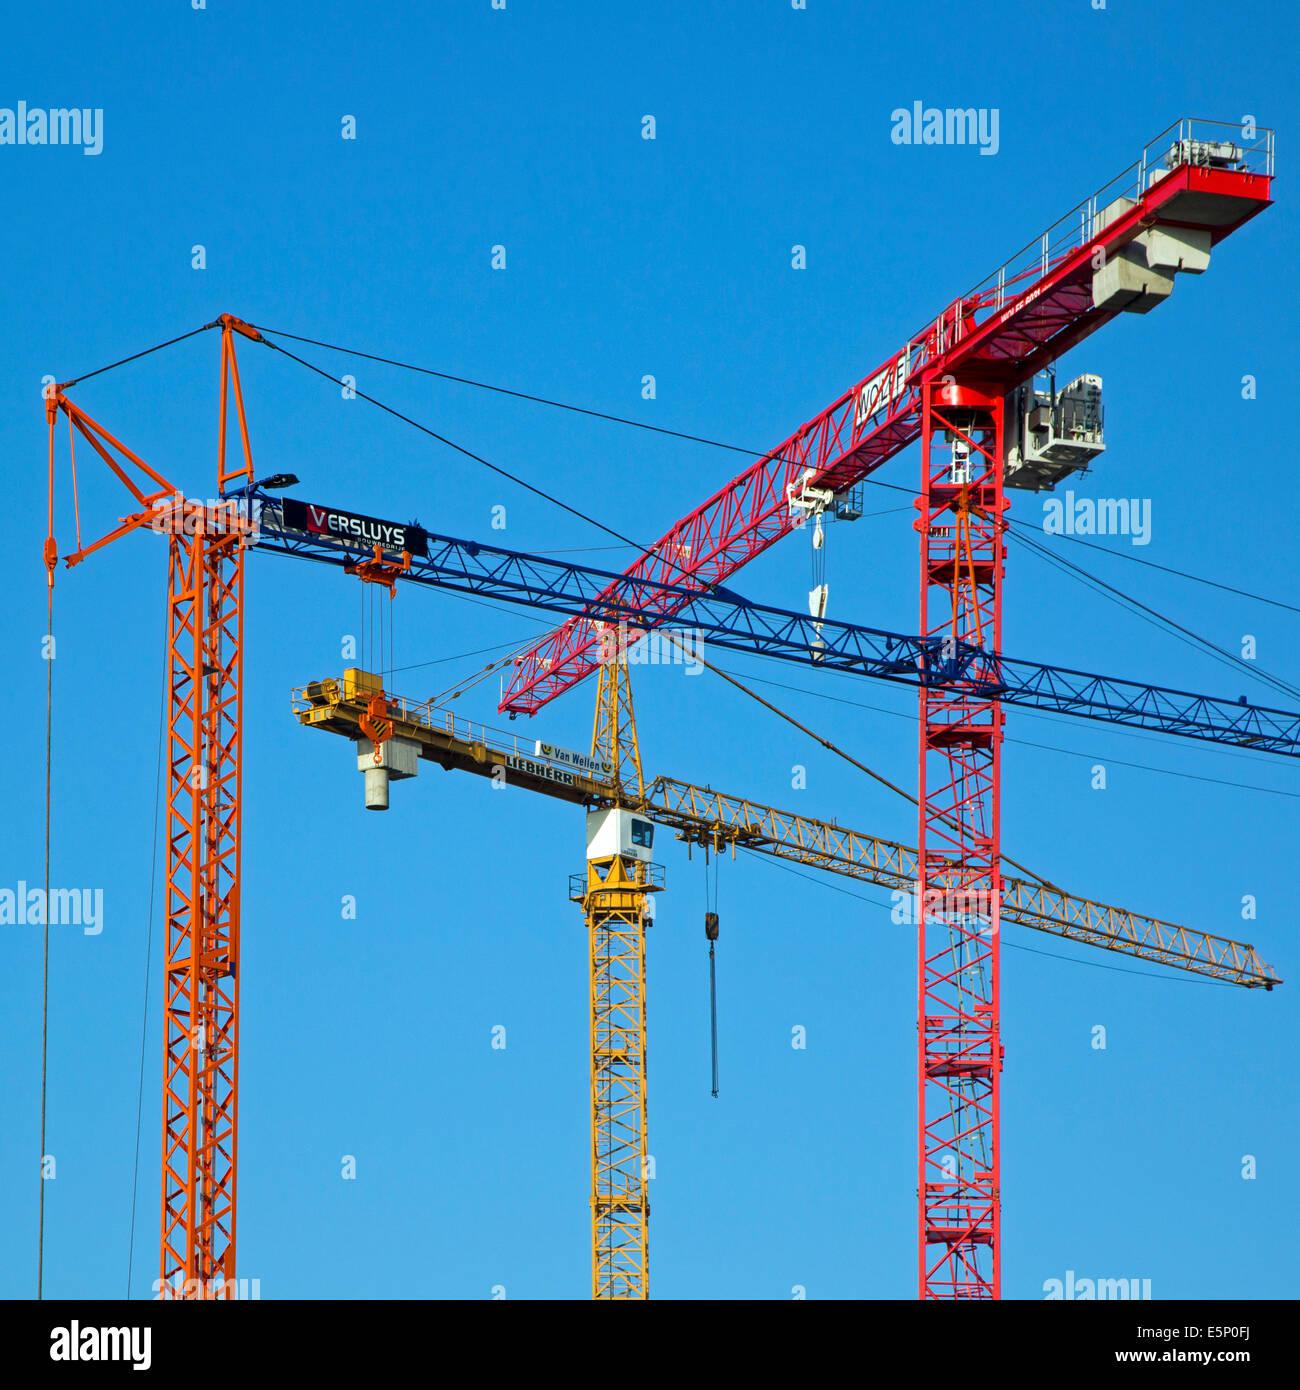 Tre gru edili / gru a torre contro il cielo blu Immagini Stock